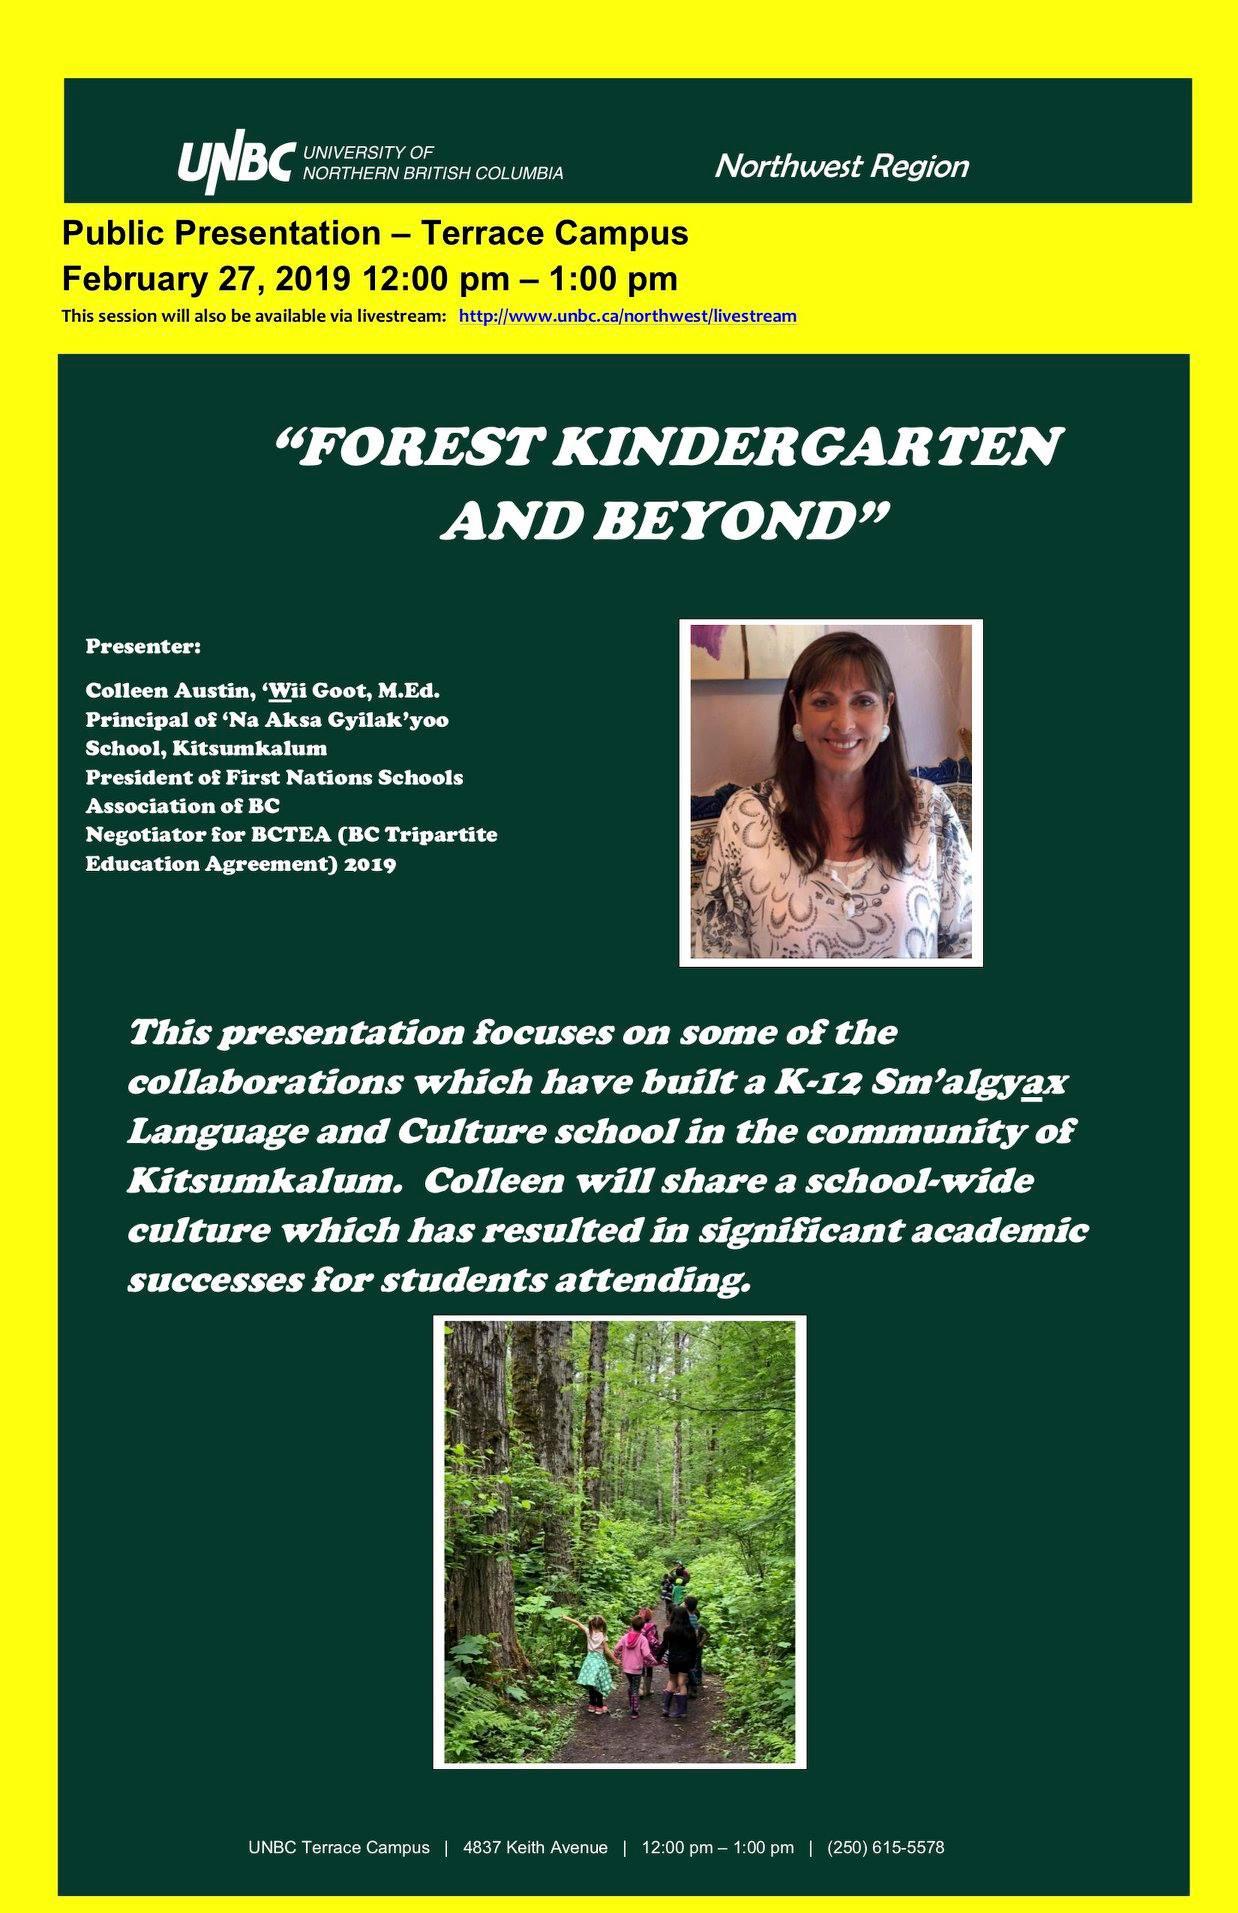 Public Presentation: Forest Kindergarten and Beyond